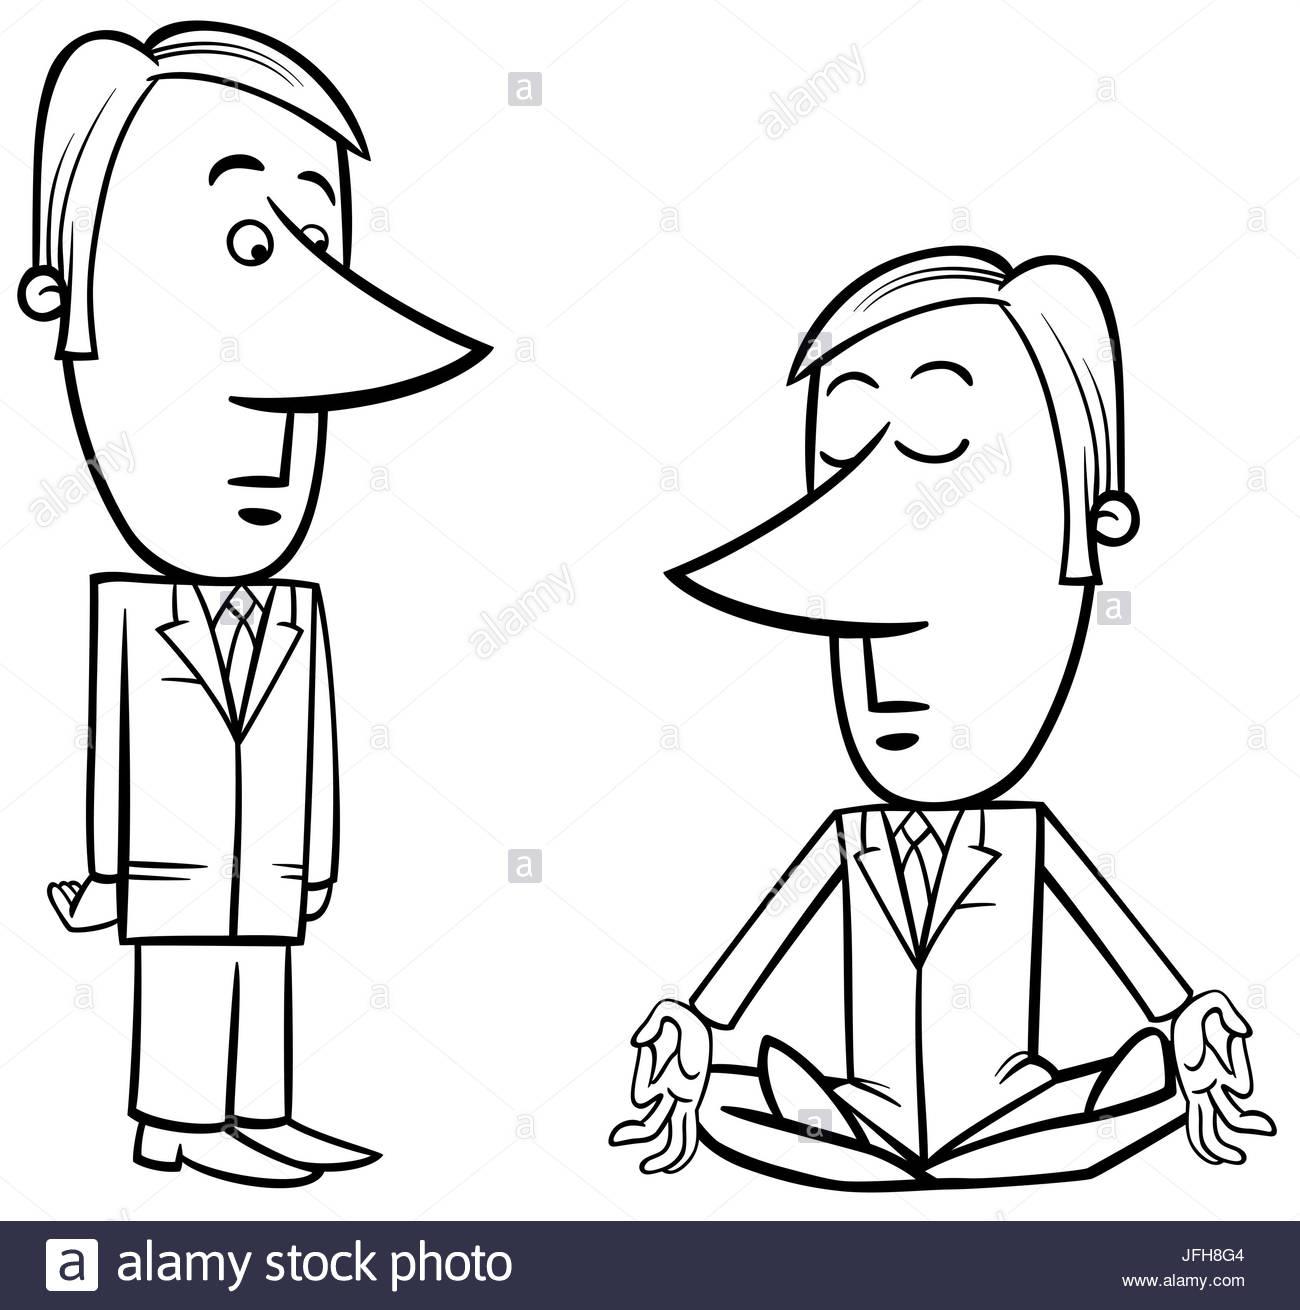 1300x1310 Meditating Businessman Drawing Stock Photo, Royalty Free Image